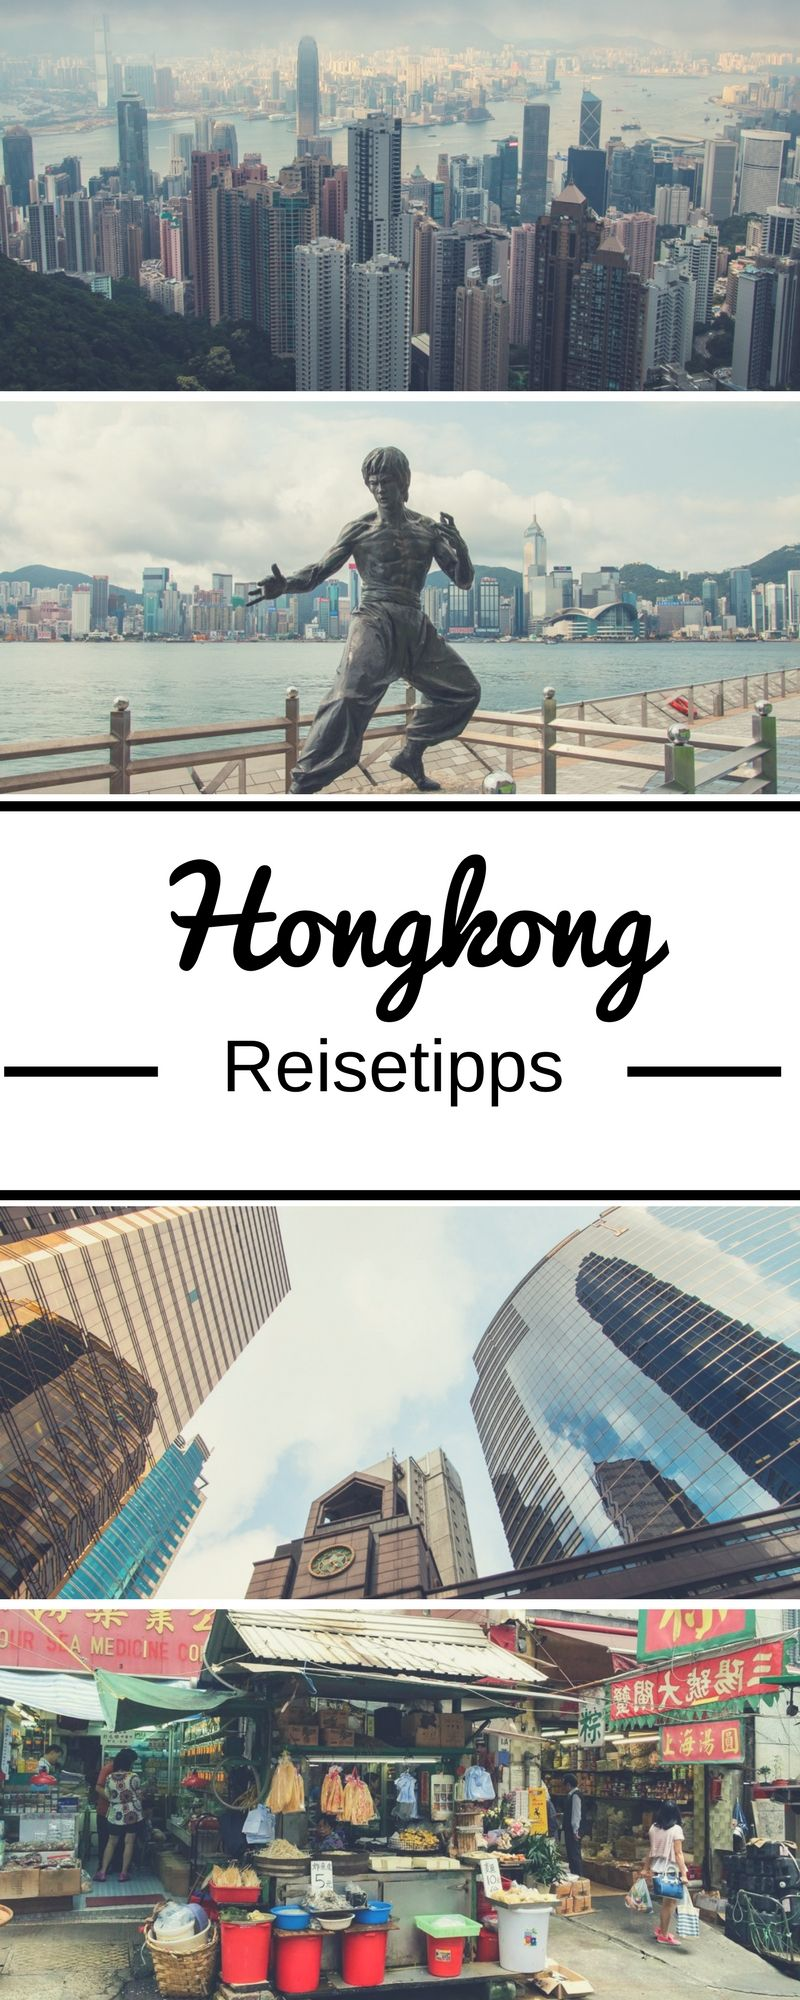 Hongkong, my love - ein Travel Guide - Travel on Toast